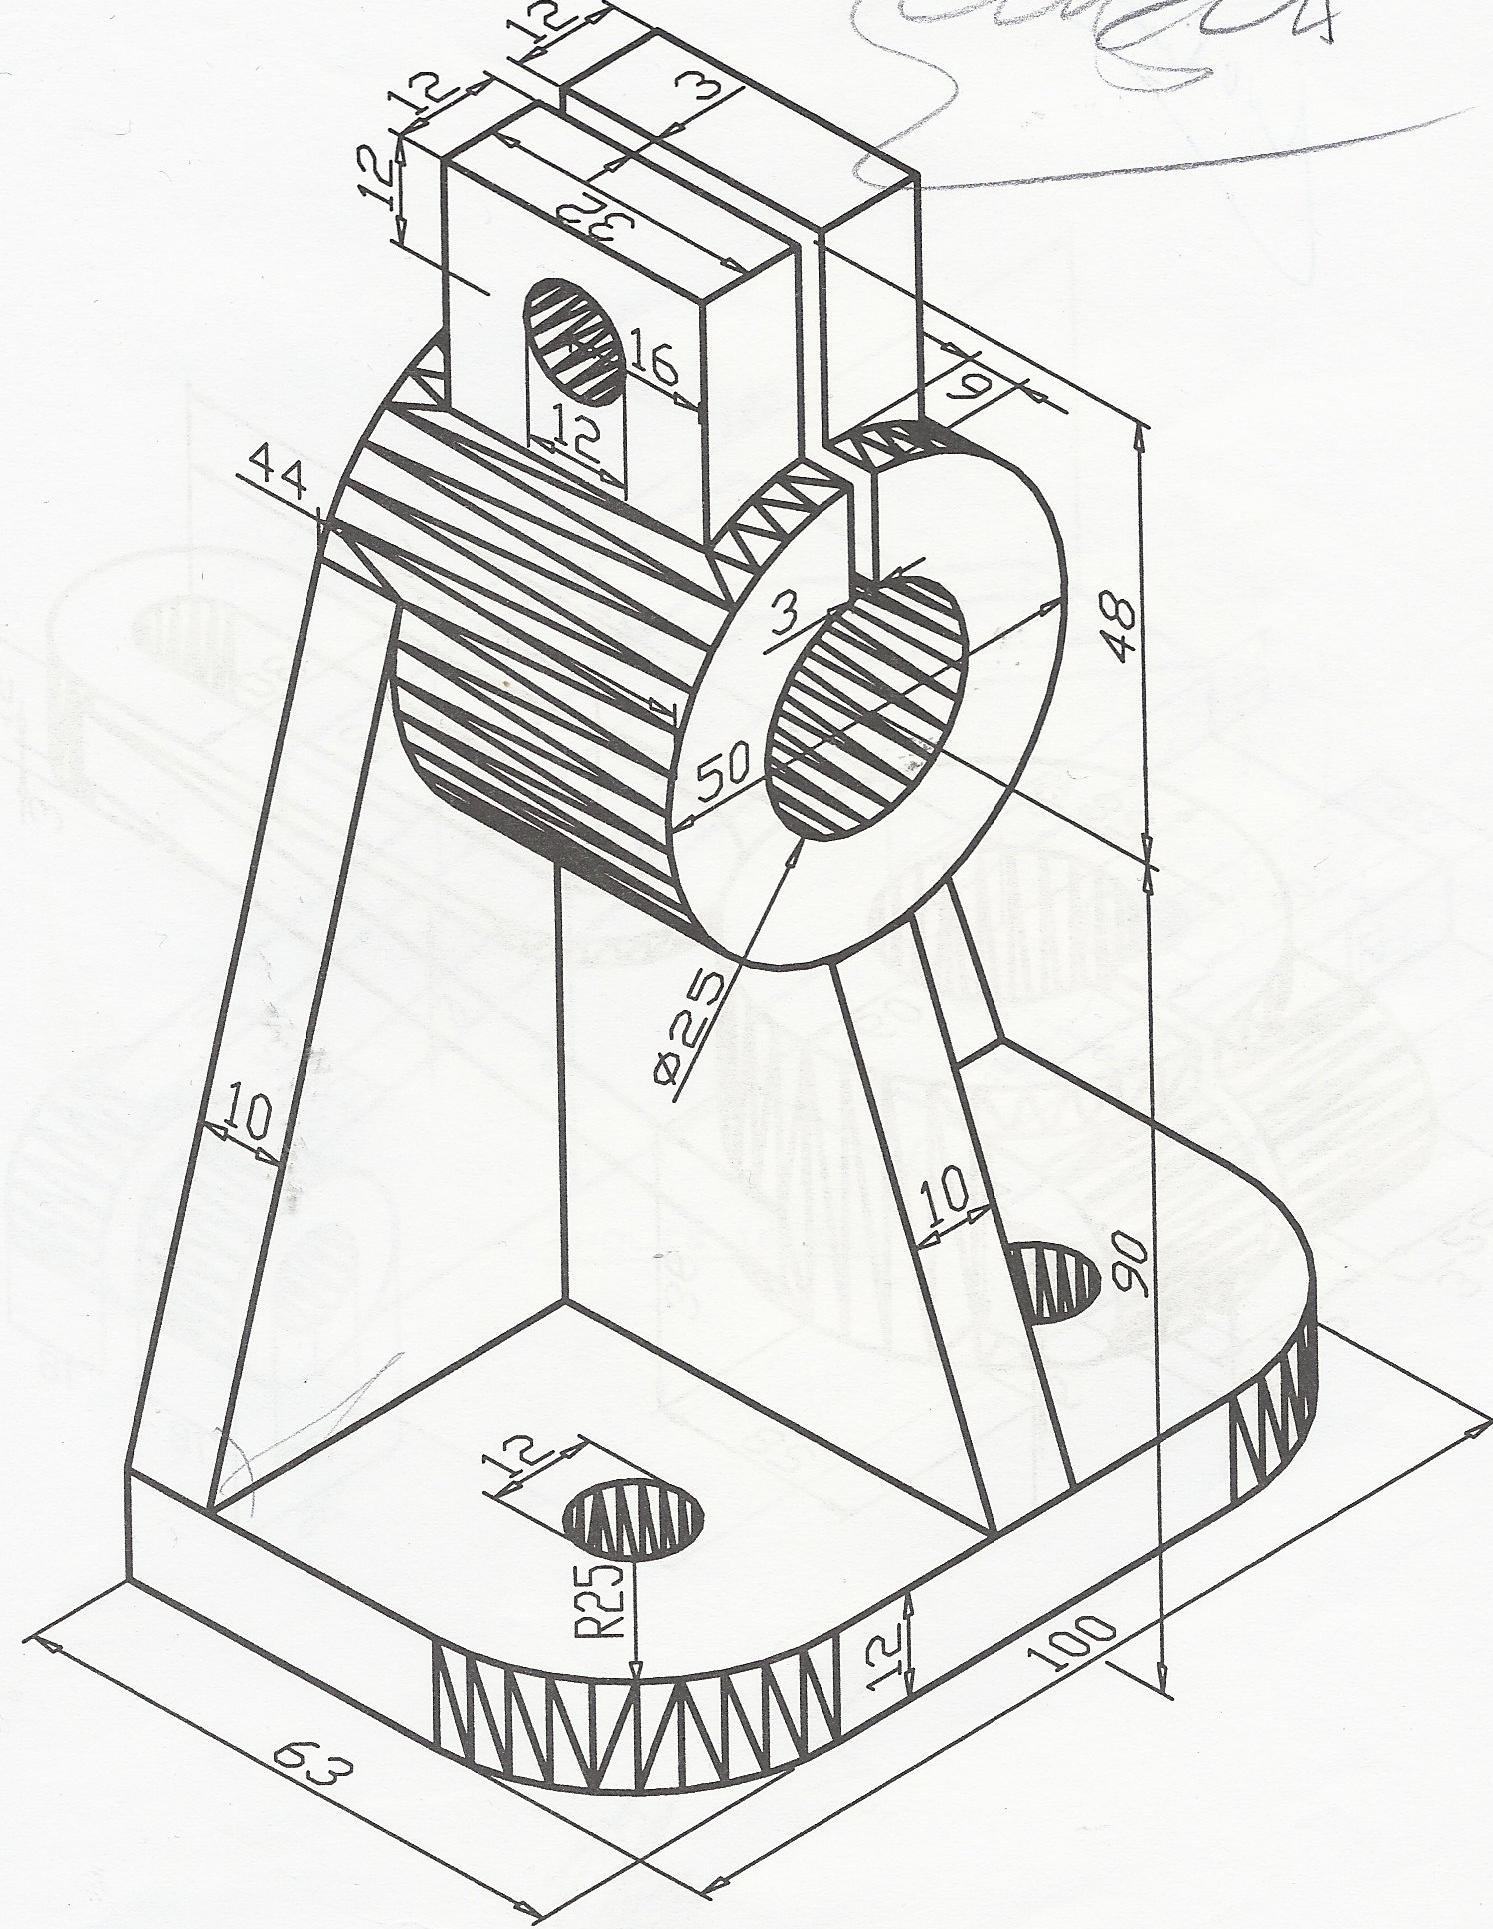 tutorial 15 3d engineering drawing 2 auto cad grabcad Microsoft 3D Design step 4